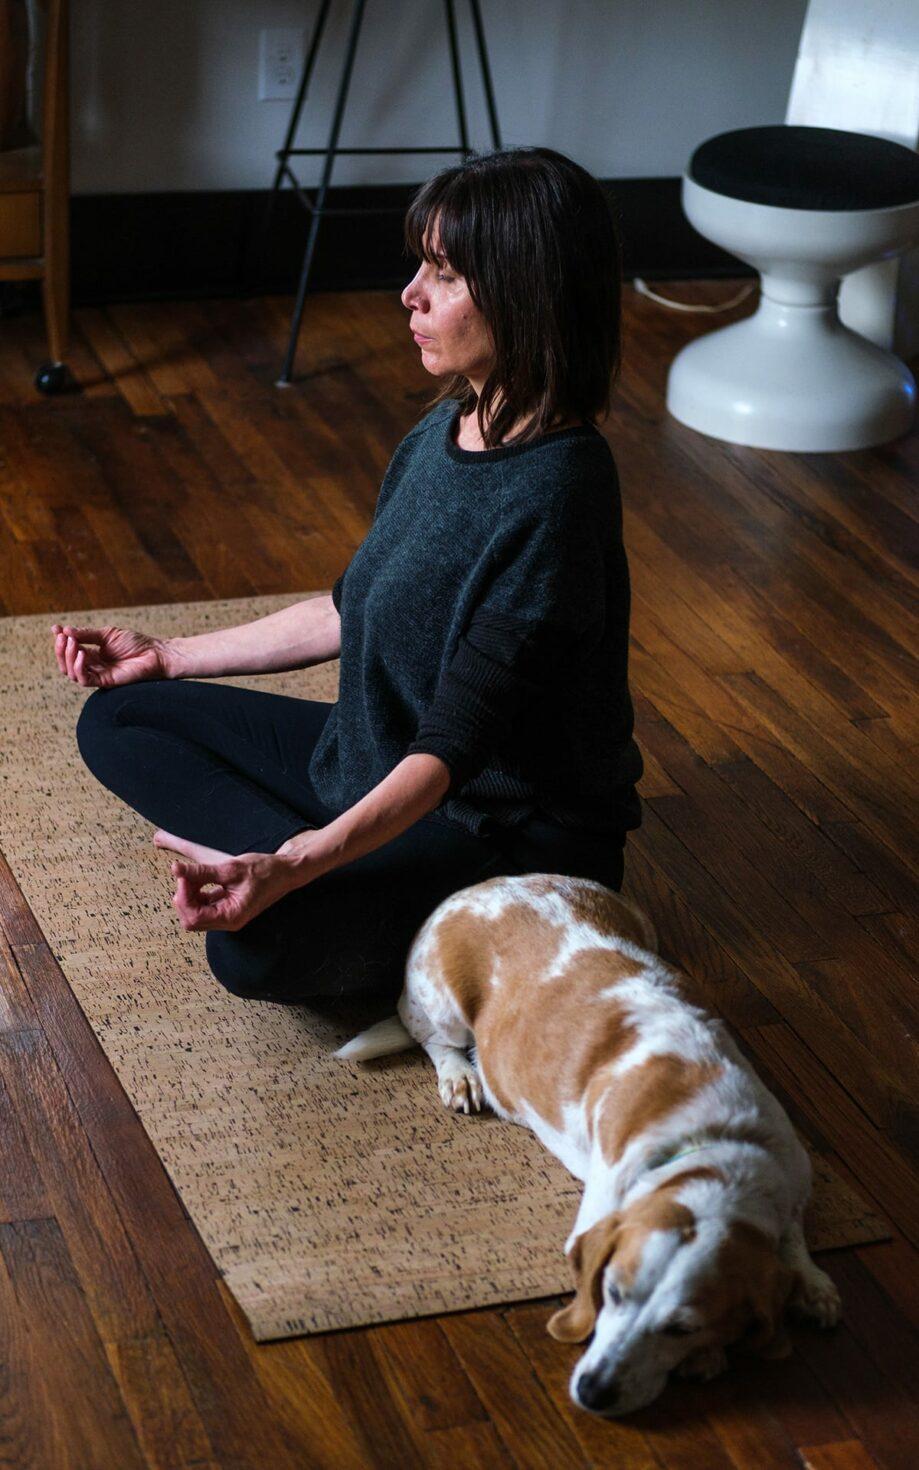 A woman meditating next to a sleeping dog